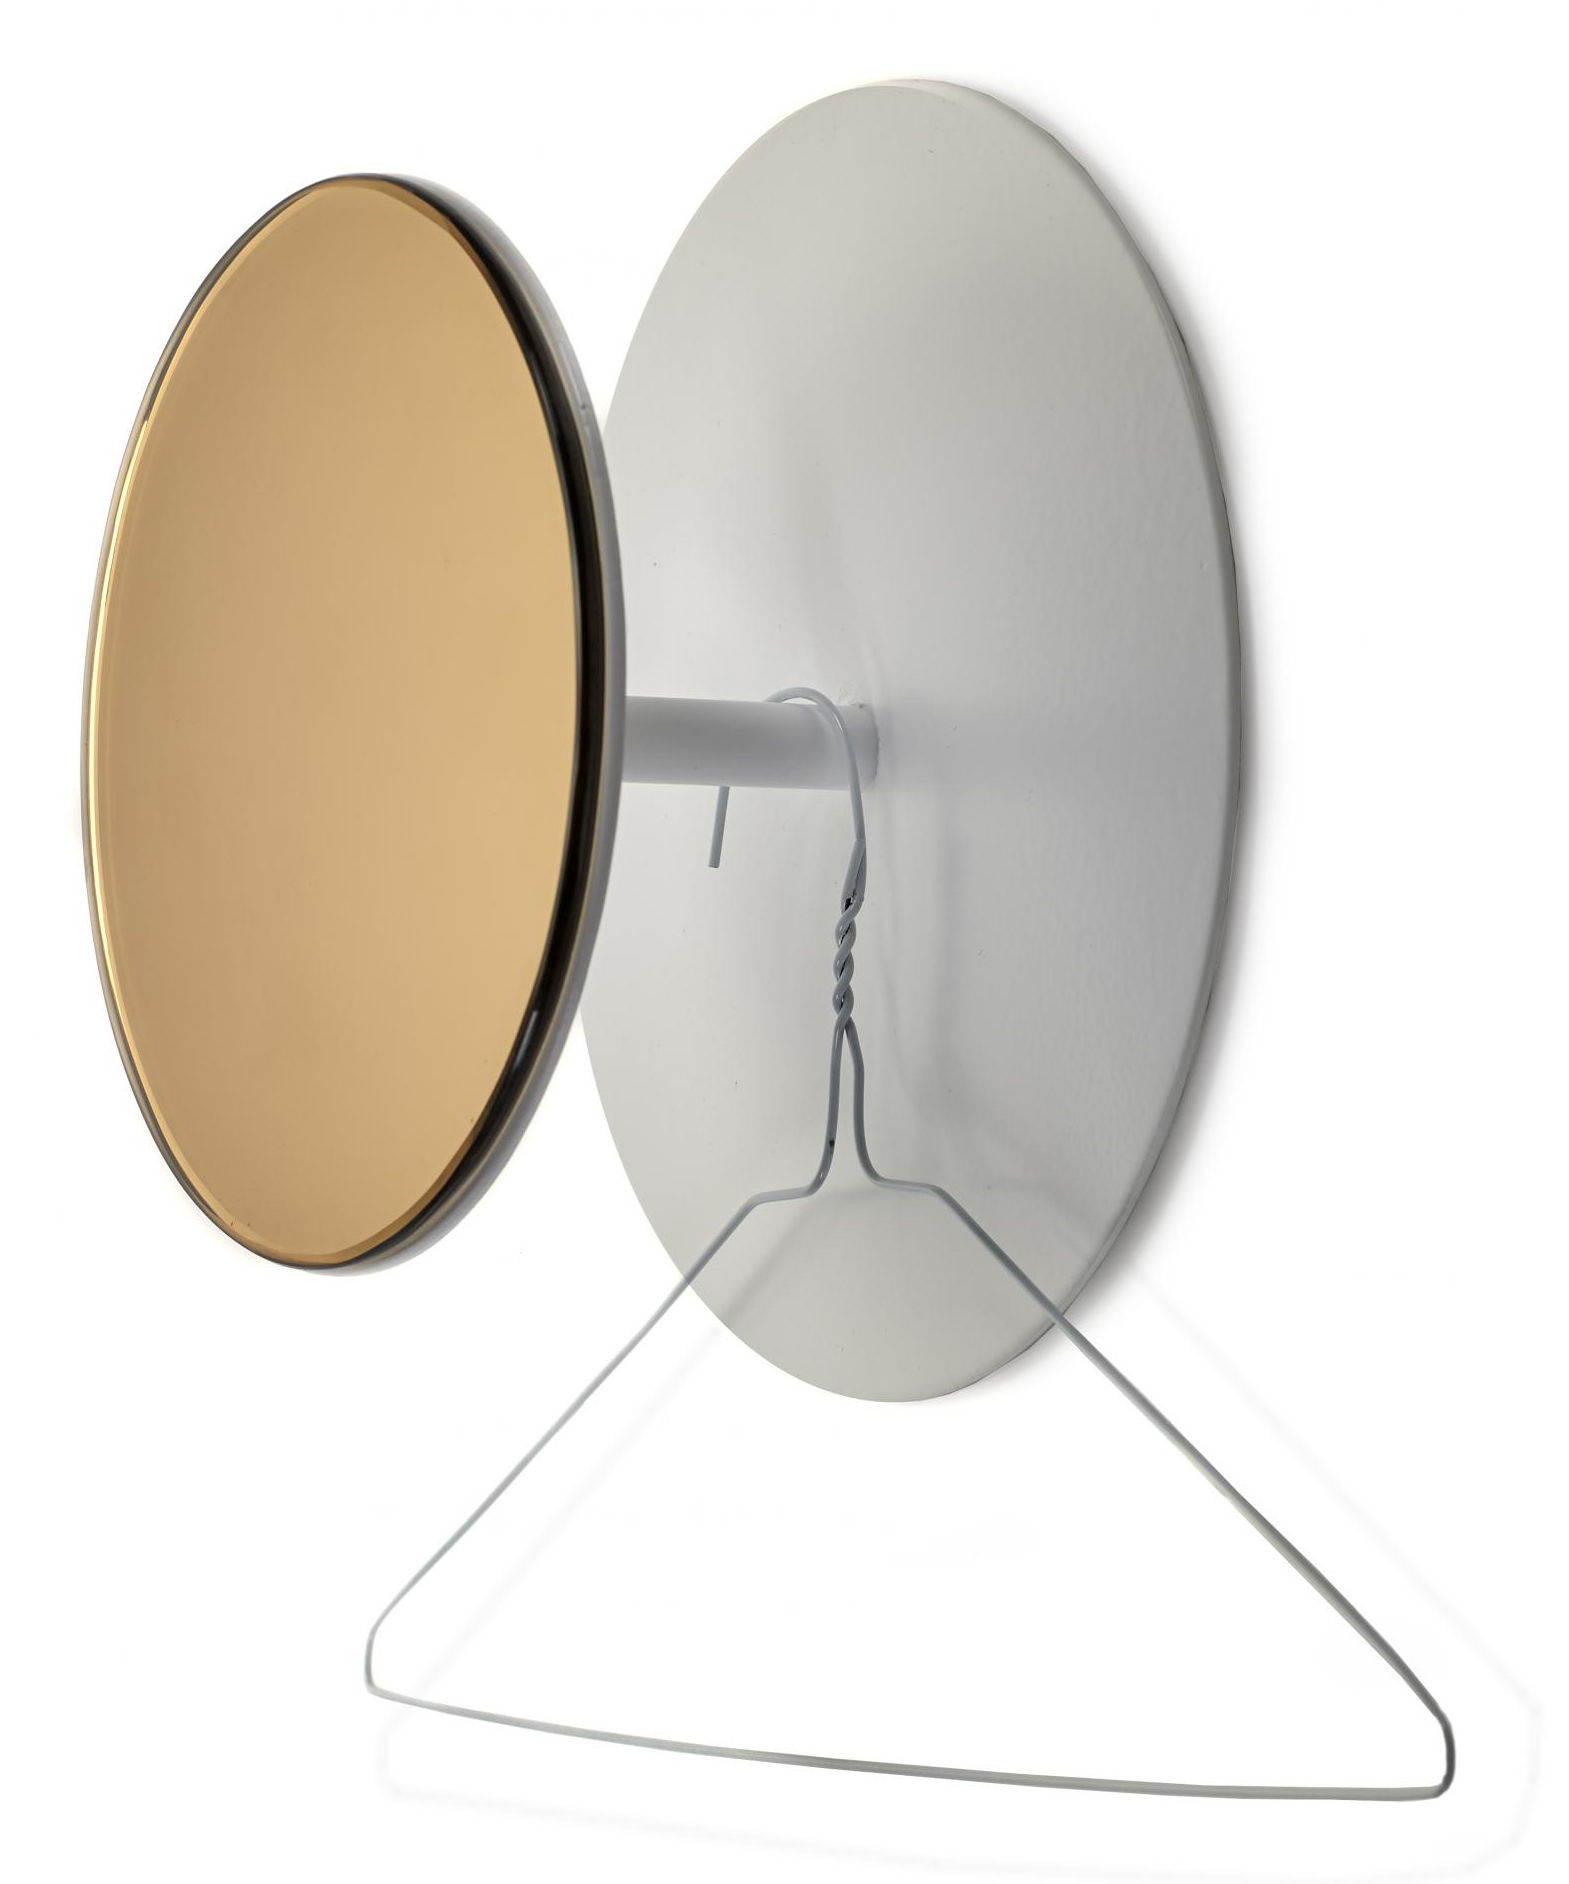 pat re reflect miroir 25 cm blanc miroir cuivre serax. Black Bedroom Furniture Sets. Home Design Ideas